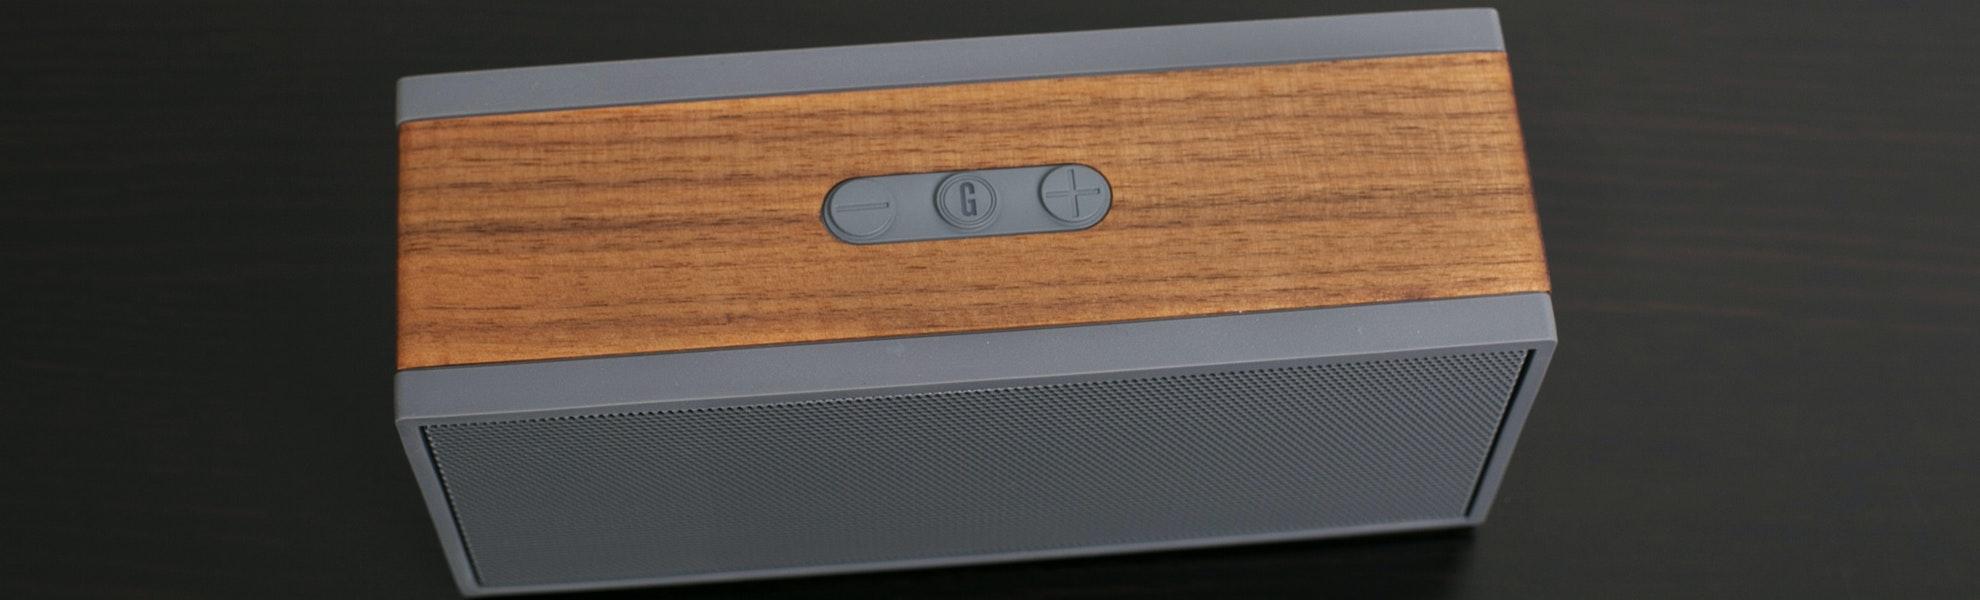 Grain Audio PWS Bluetooth Speaker